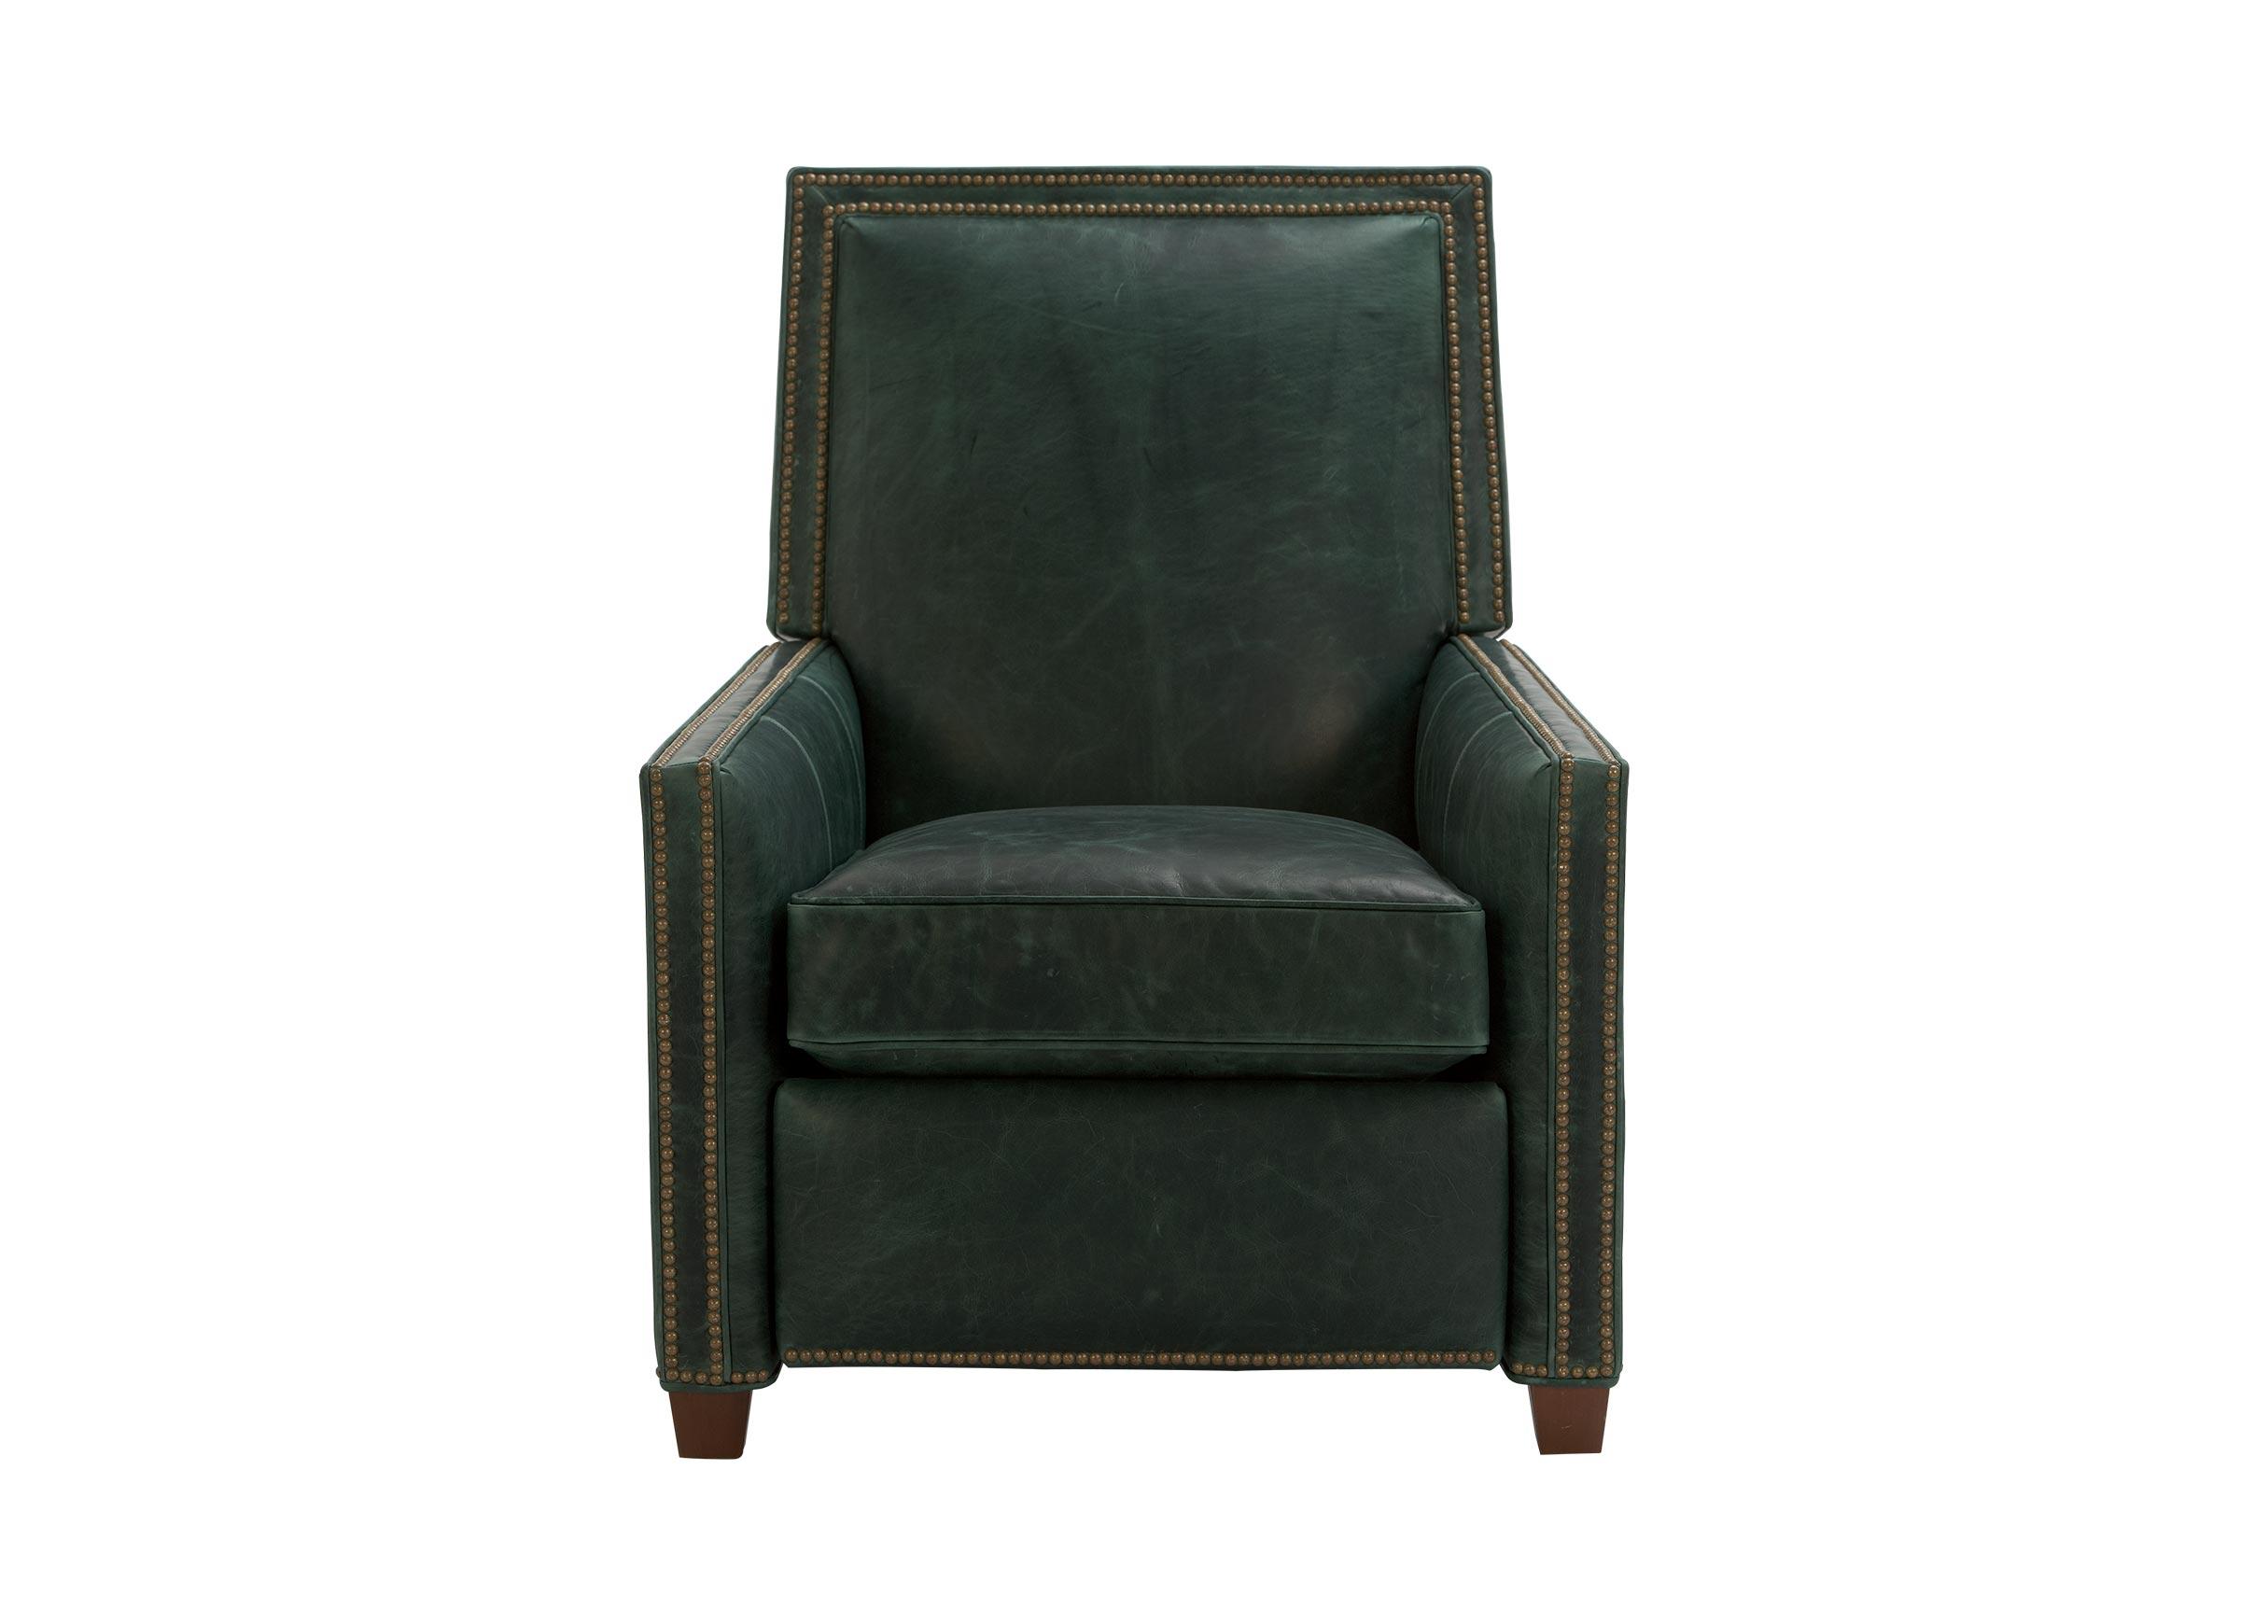 ethan allen leather chair modern side randall recliner recliners